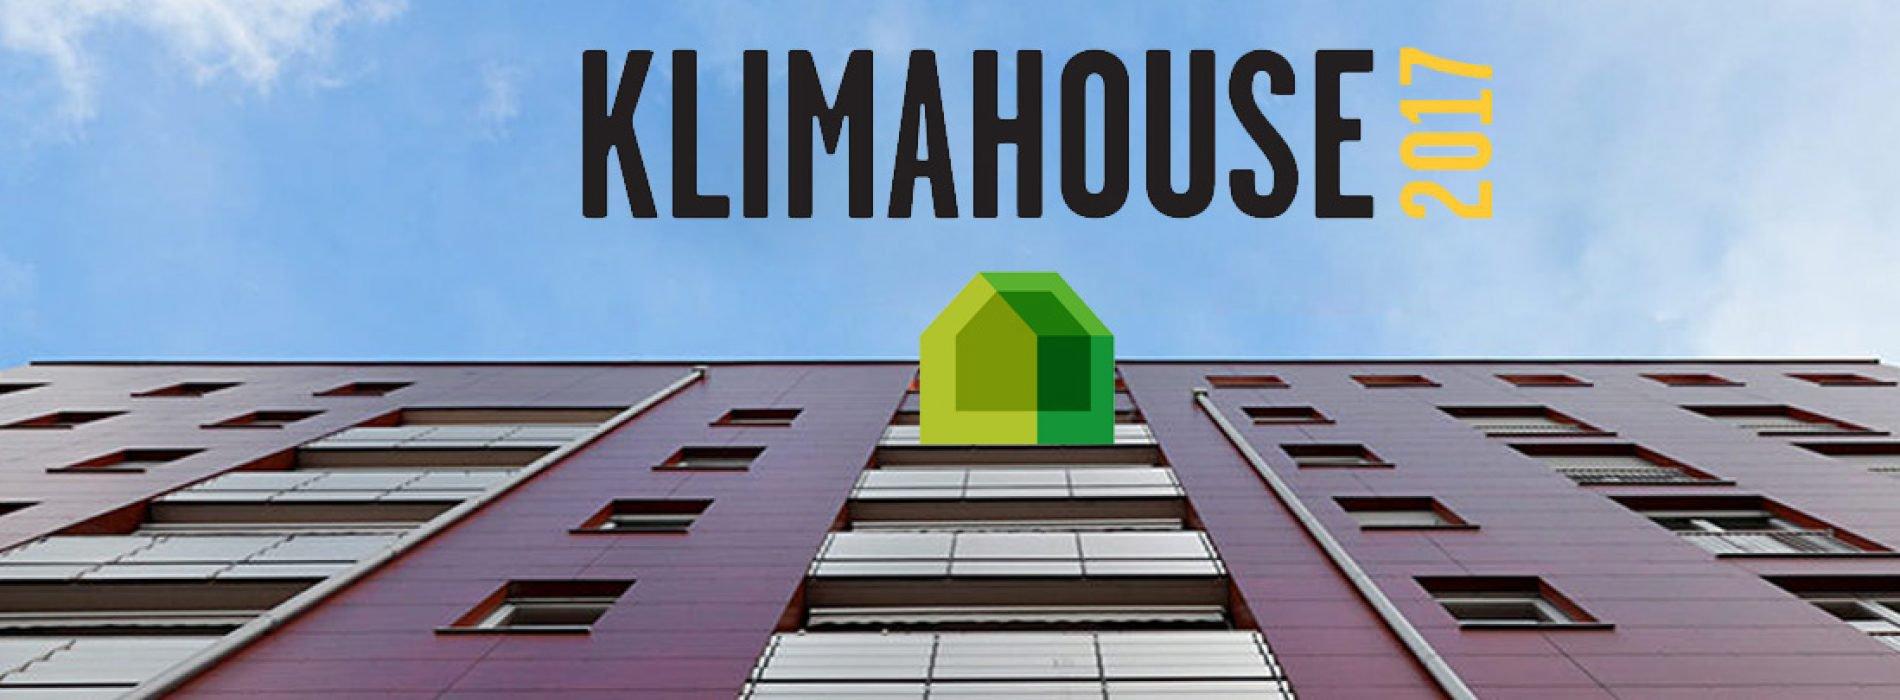 klimahouse-2017-1900x700_c